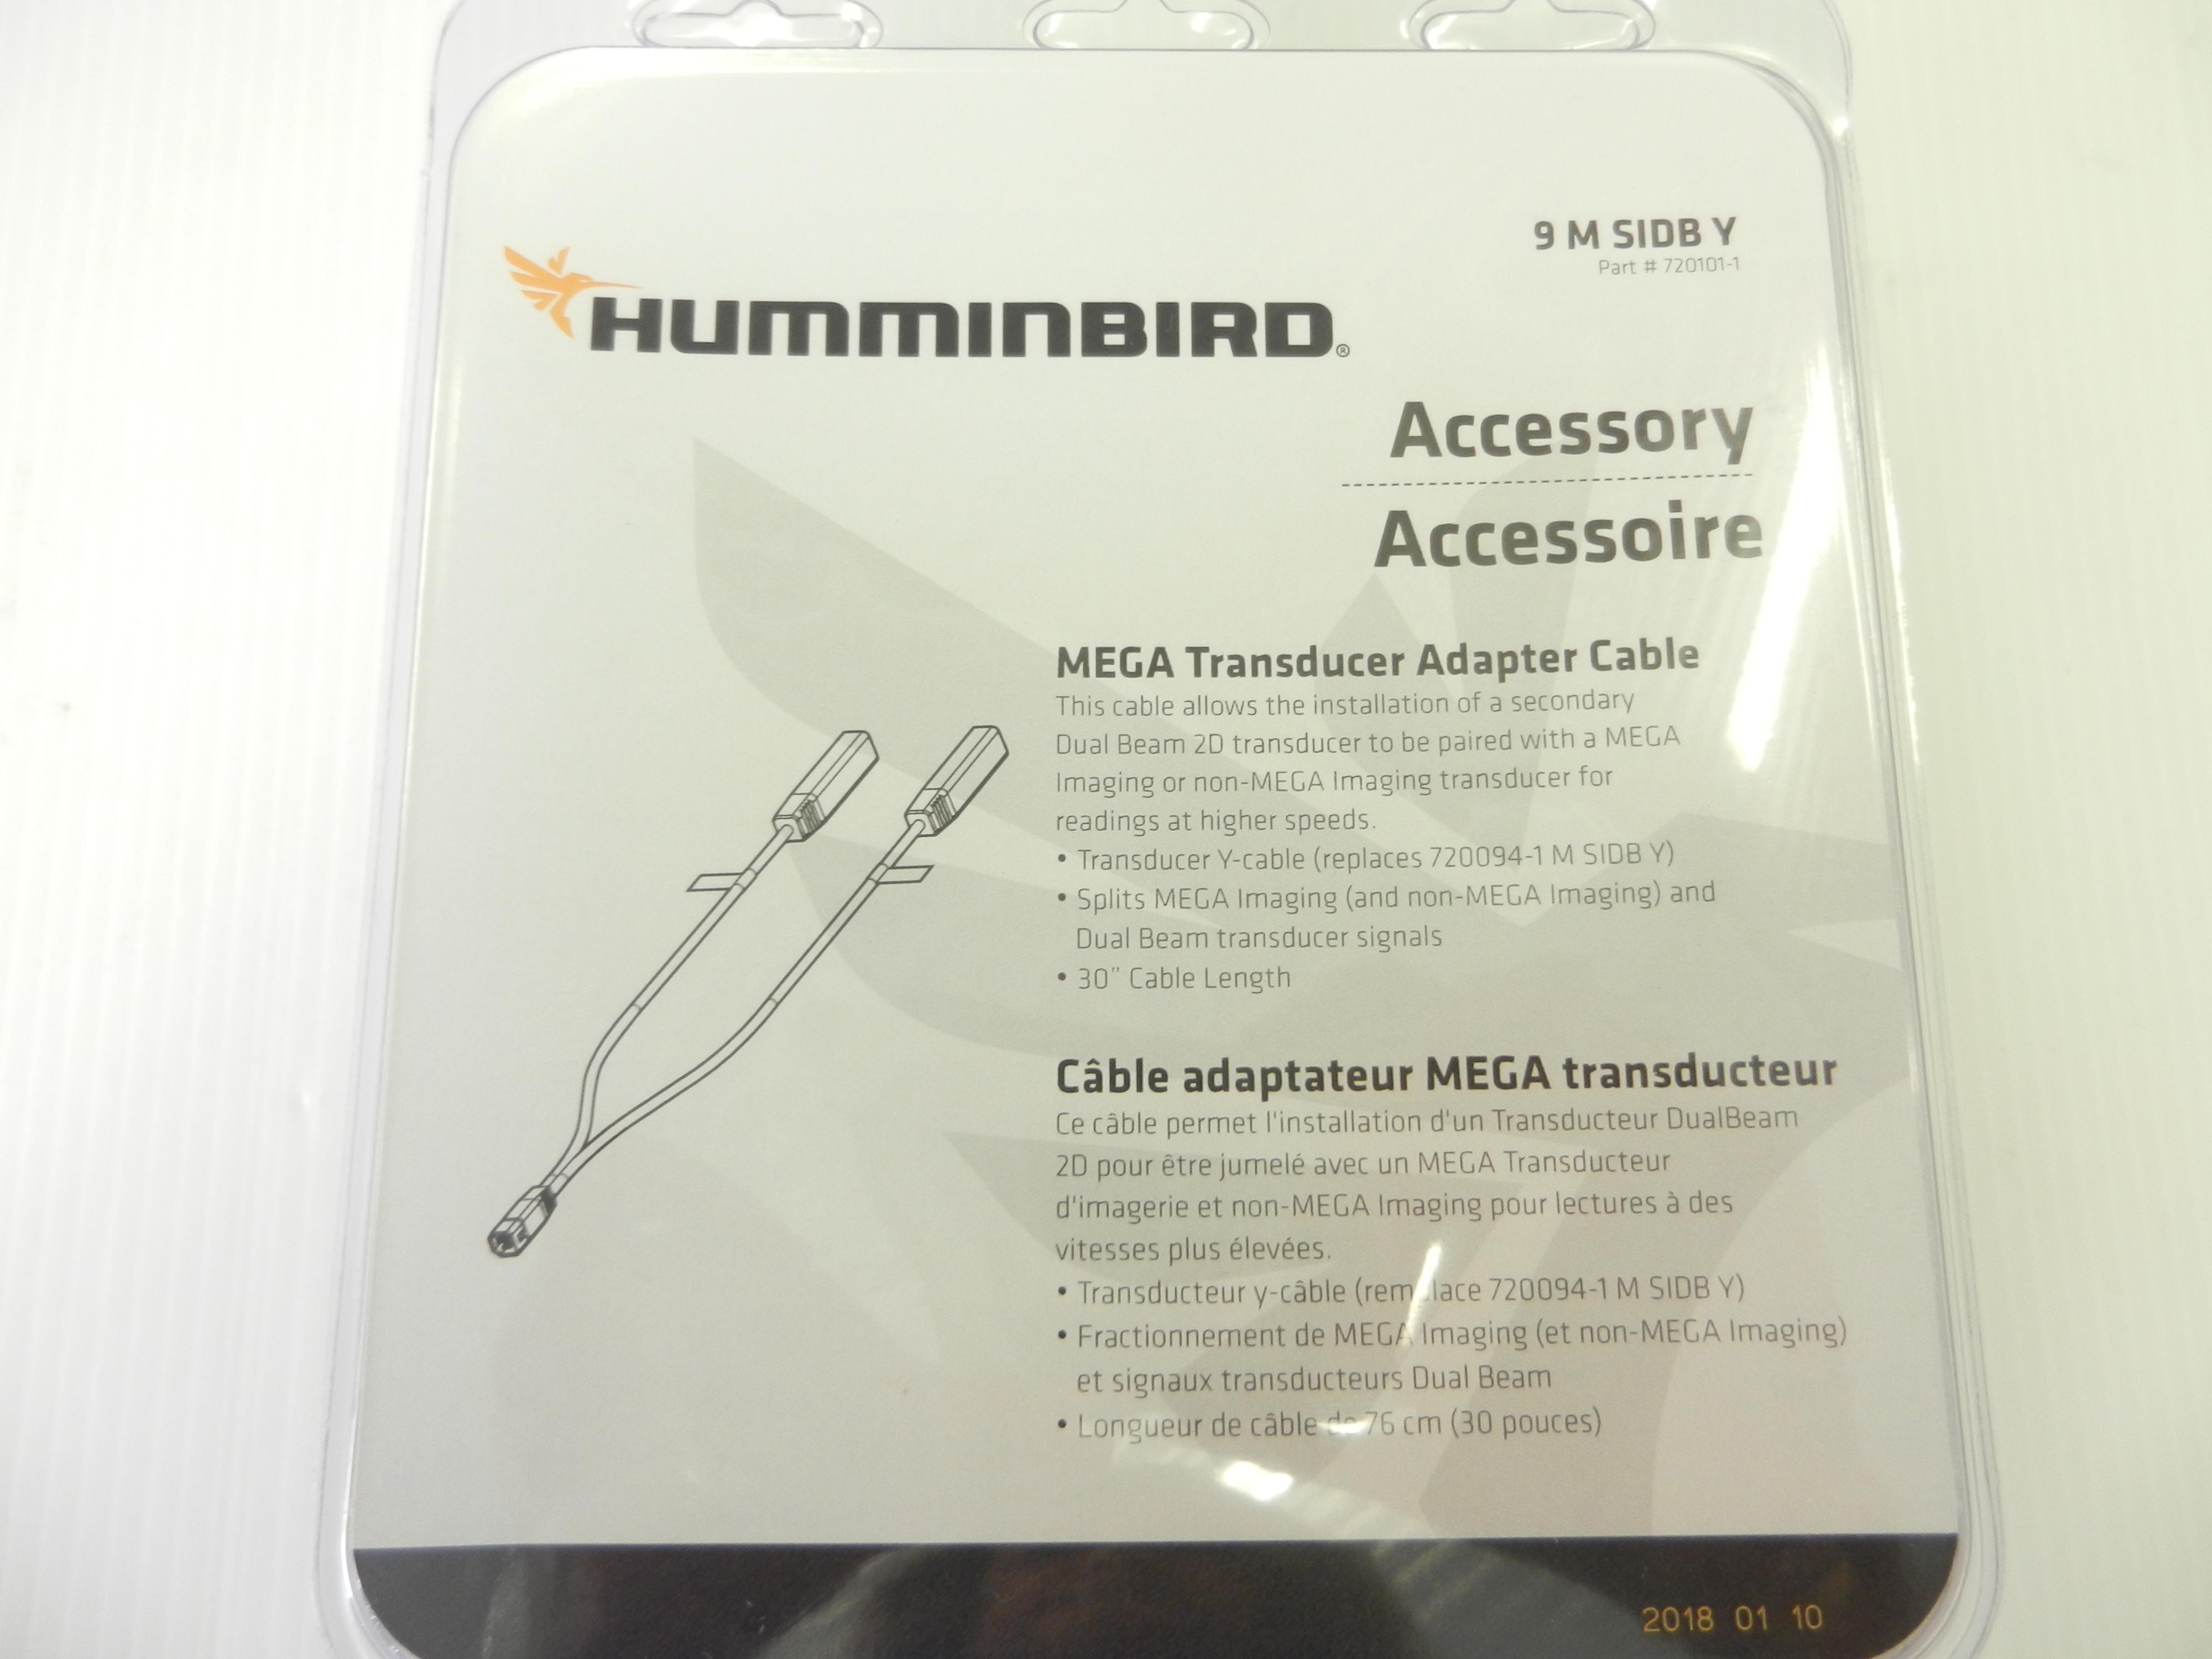 Humminbird 720101-1 9 M Sidb Y 9-Pin Side Imaging Dual Beam Splitter Cable